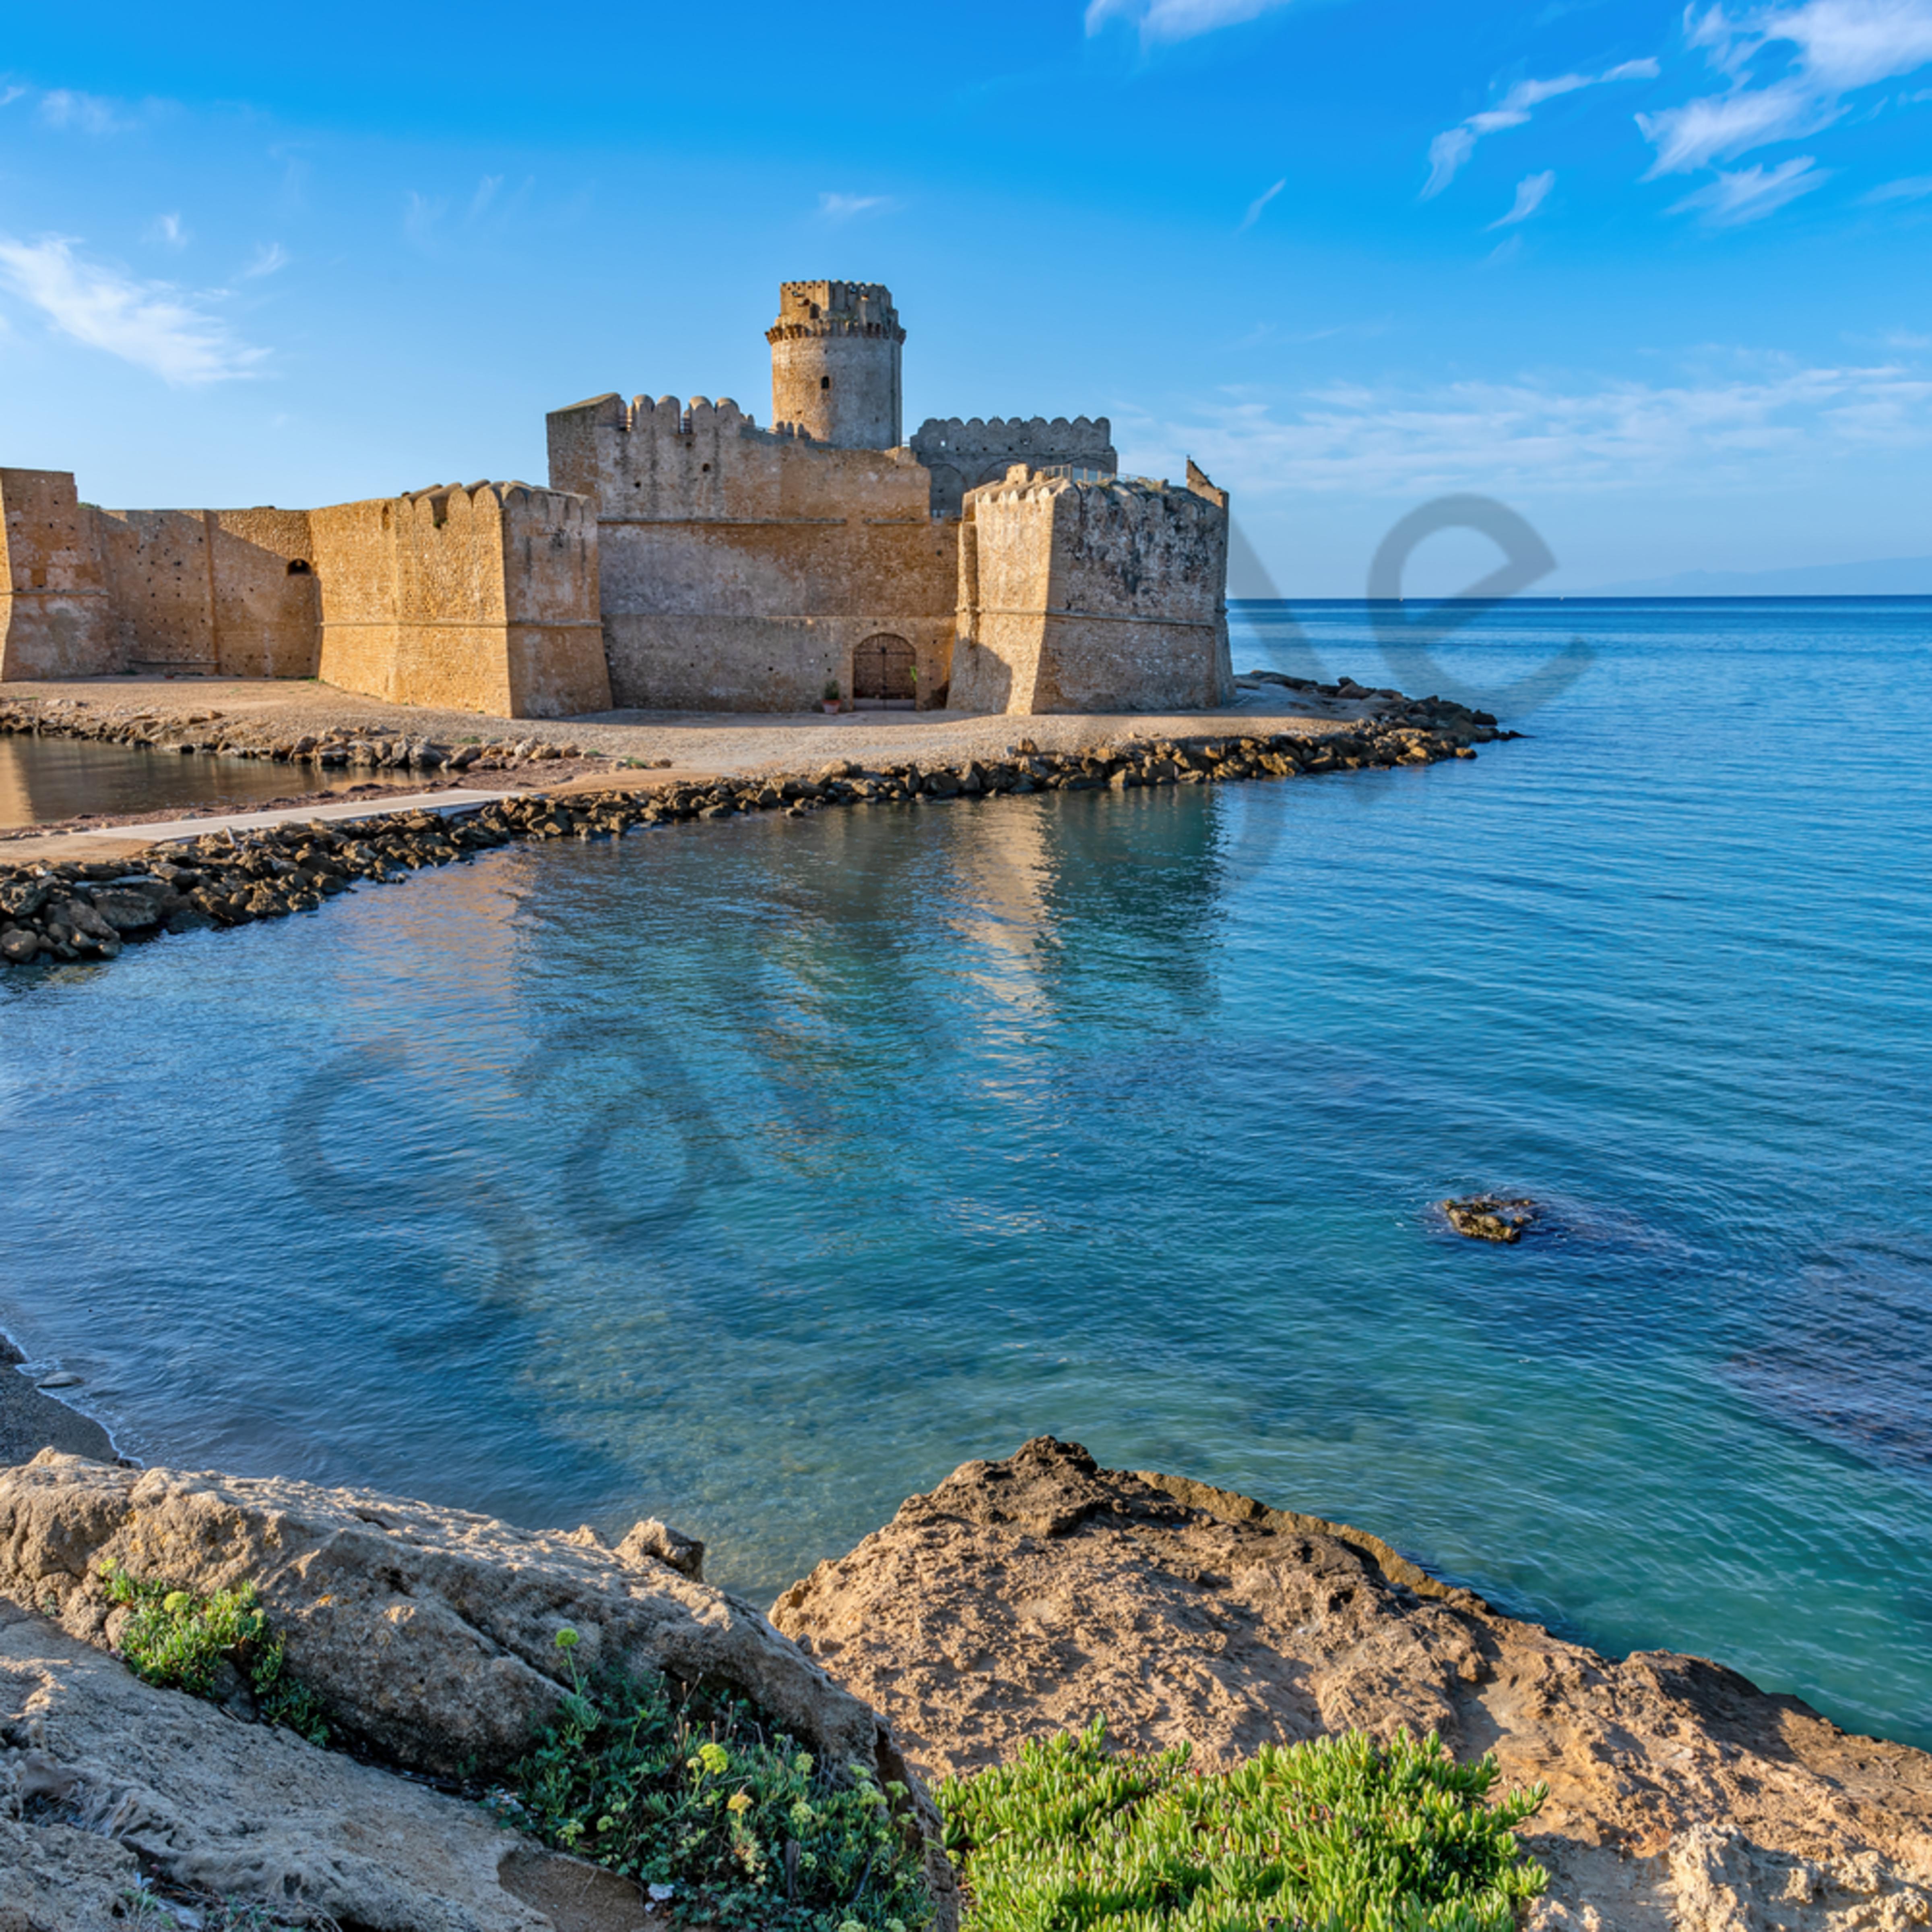 Crotone and castle calabria italy sumlsi